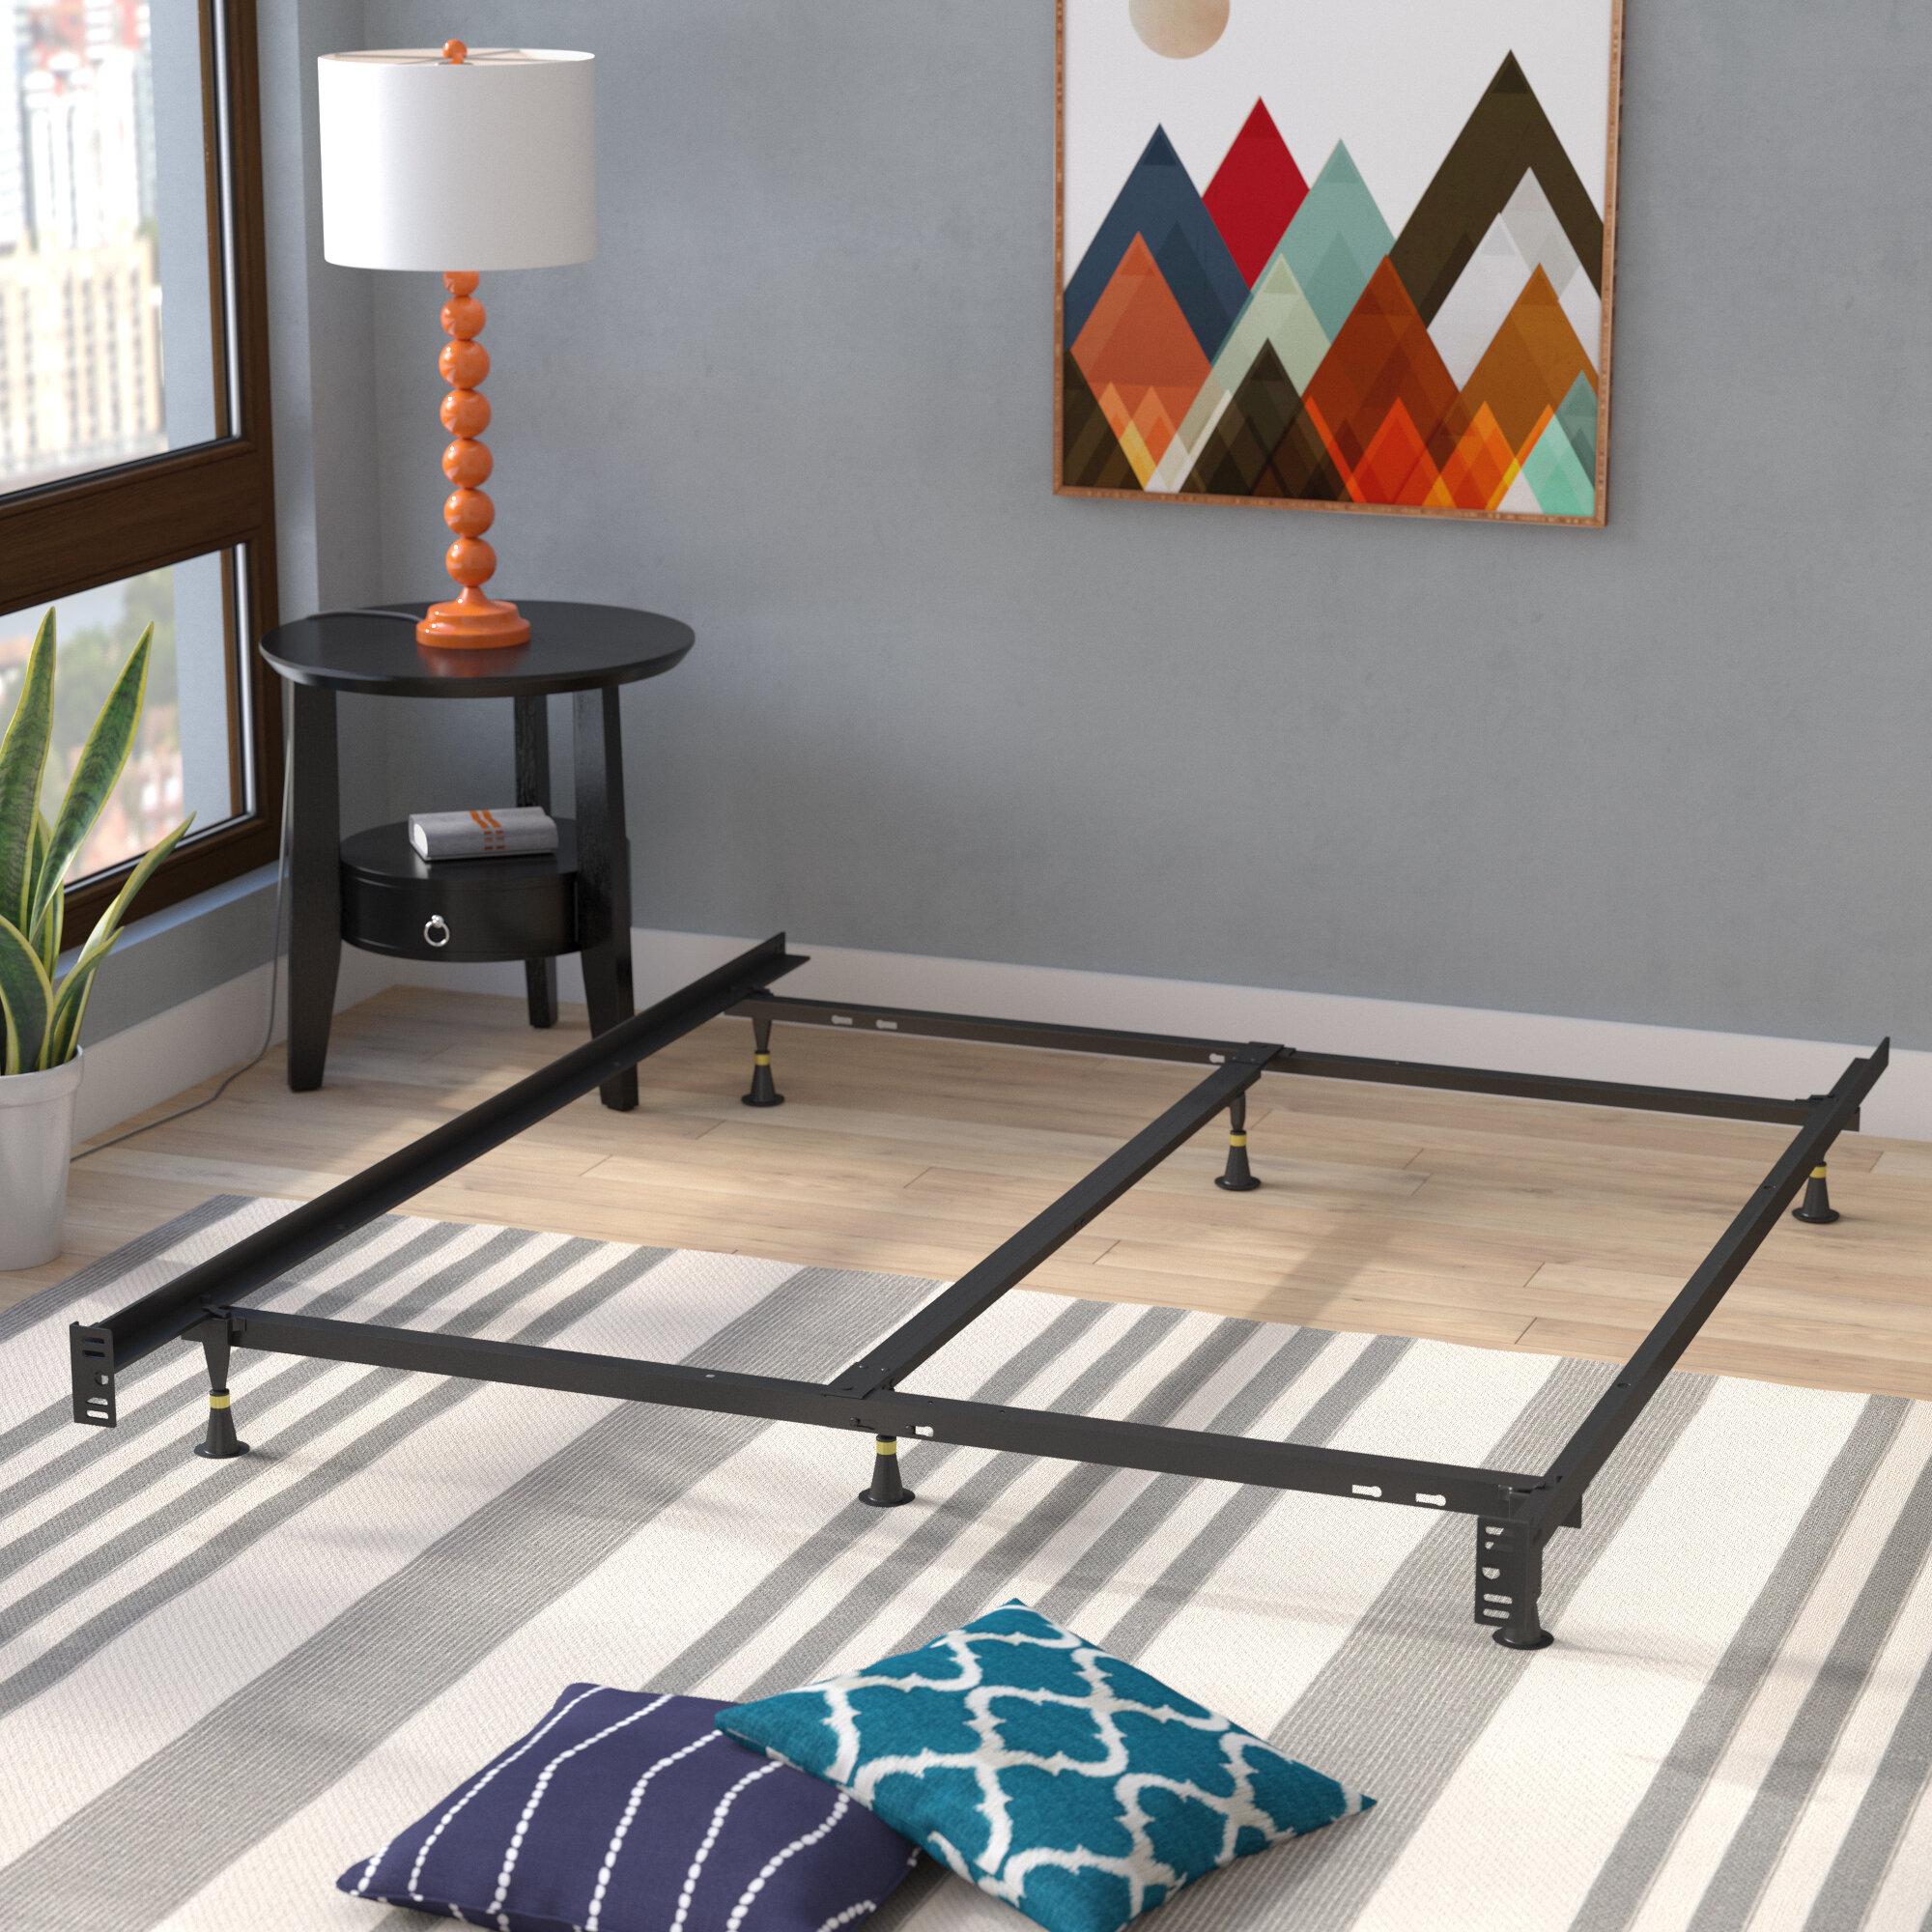 Symple Stuff 6 Leg Adjustable Metal Bed Frame Reviews Wayfair